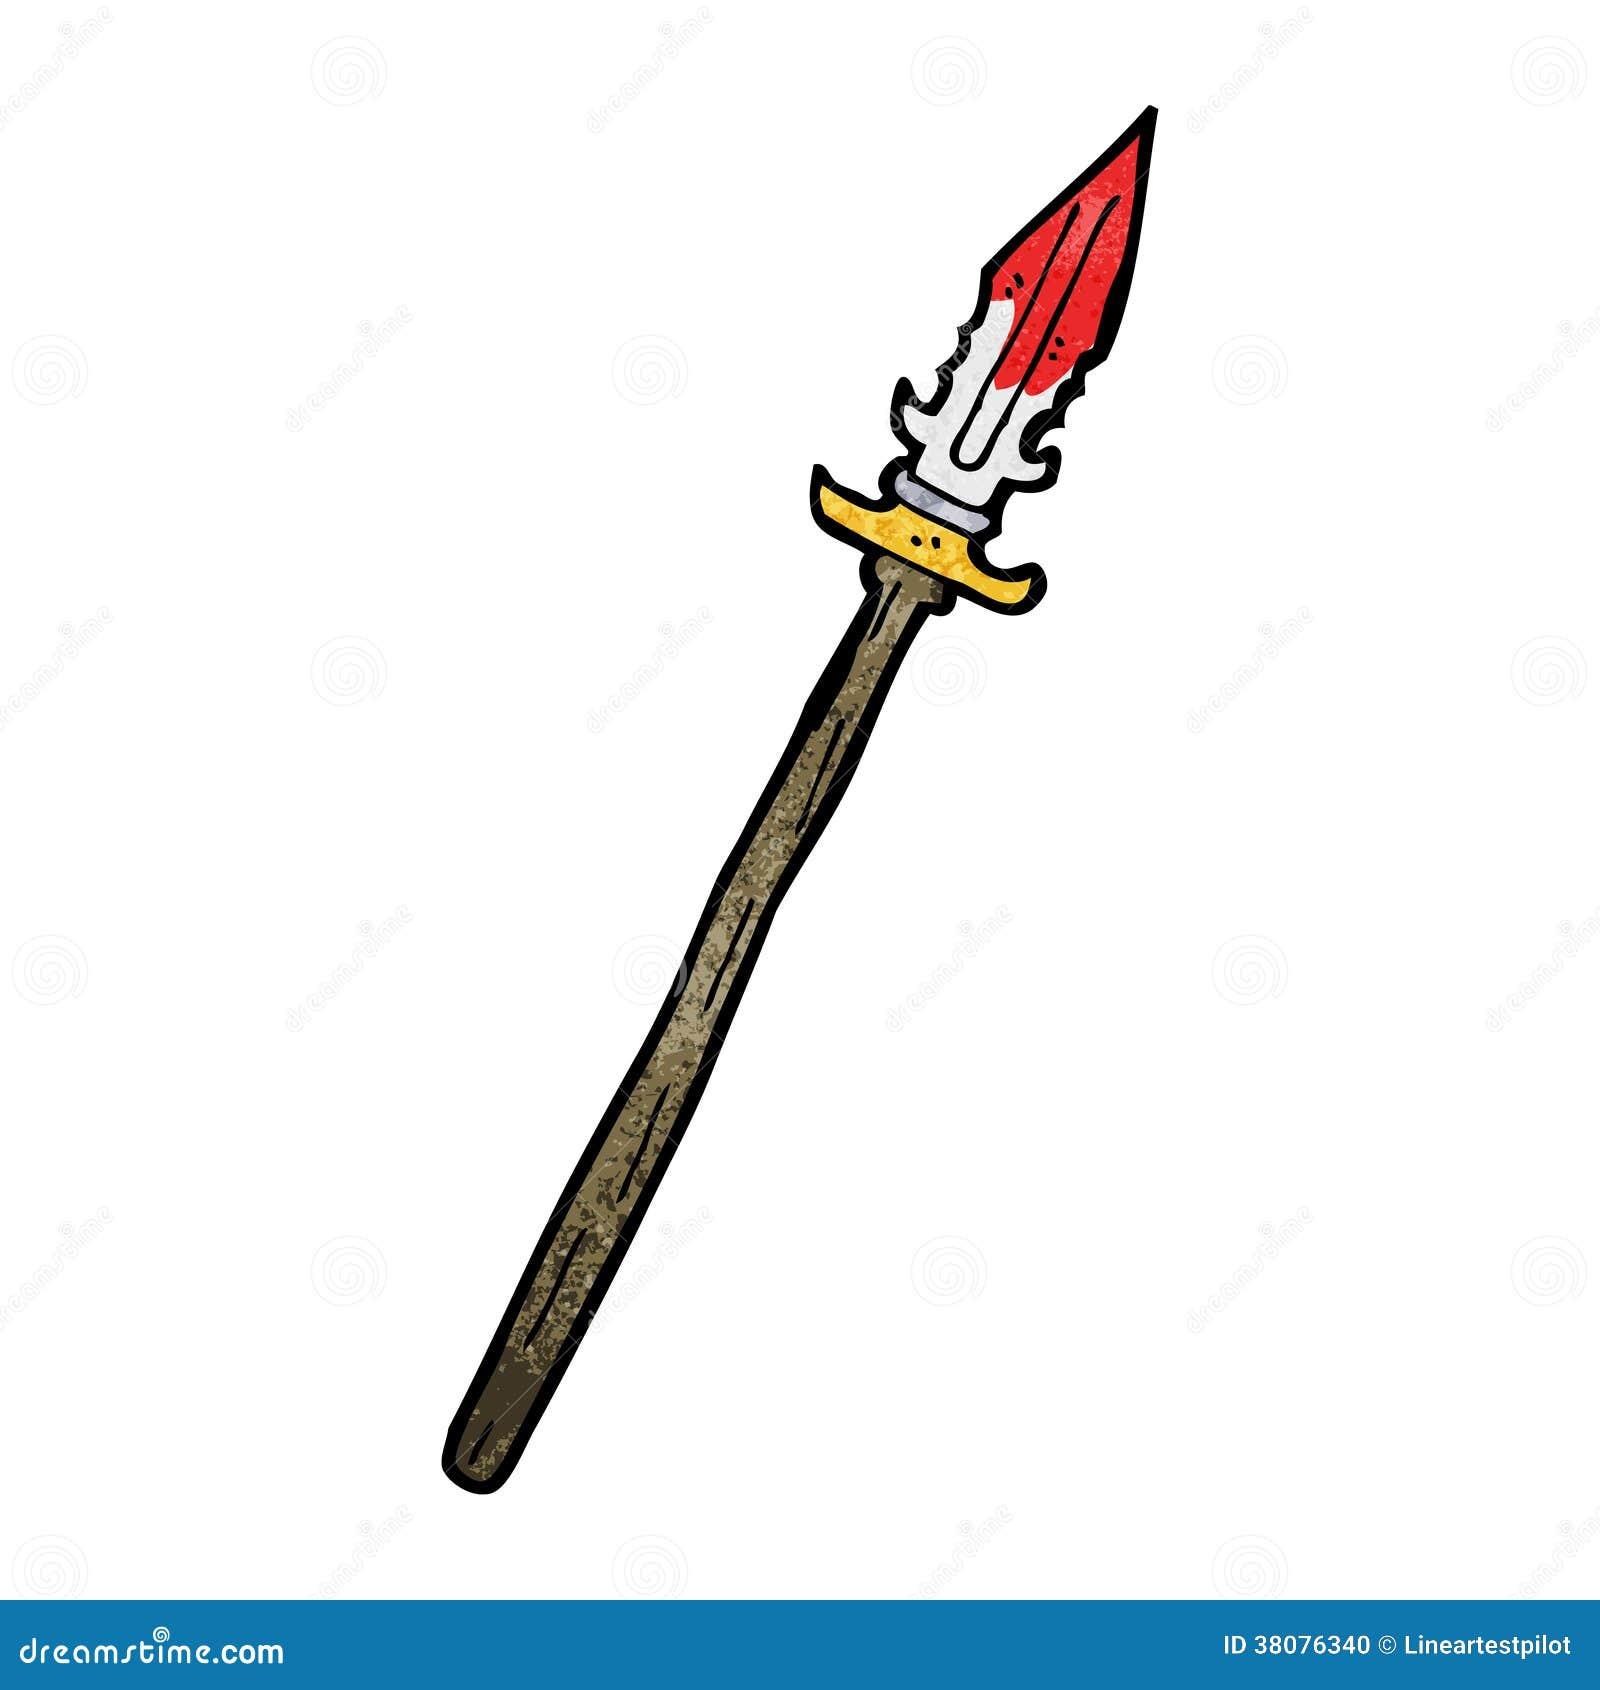 cartoon bloody spear stock illustration illustration of clip art compass navigation wedding clip art compass rose